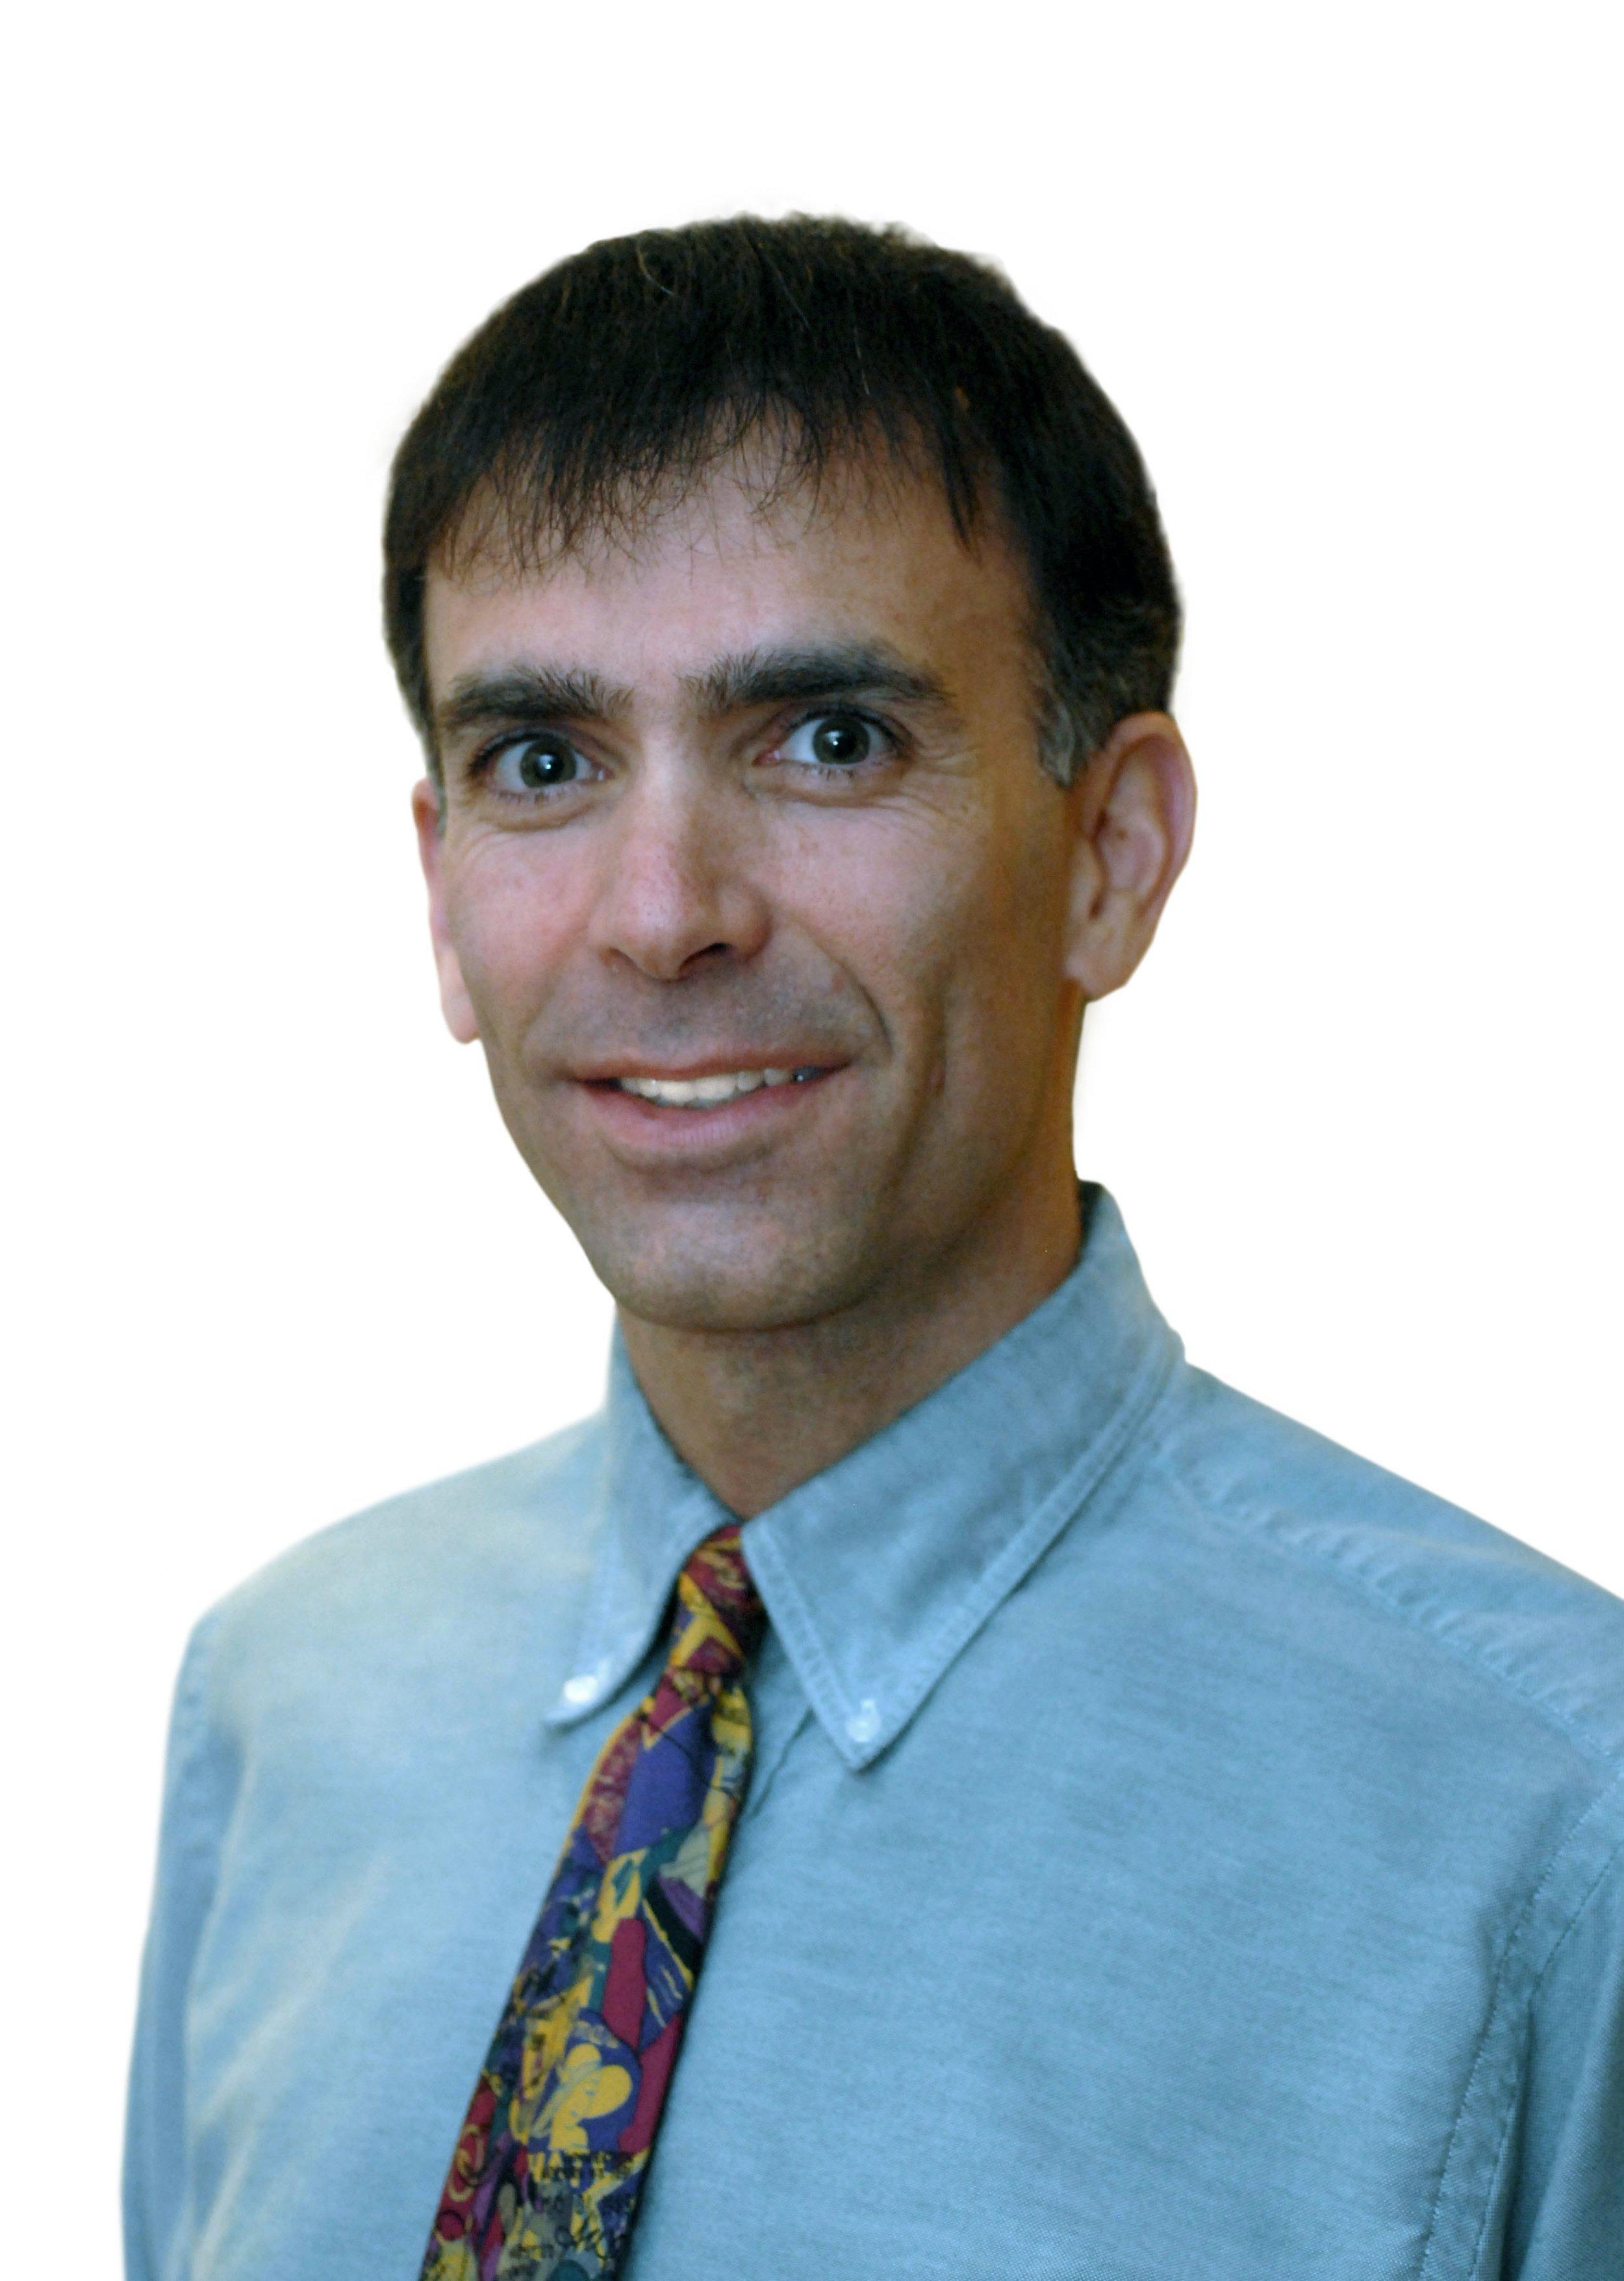 Spencer Richman  President, American Financial Network